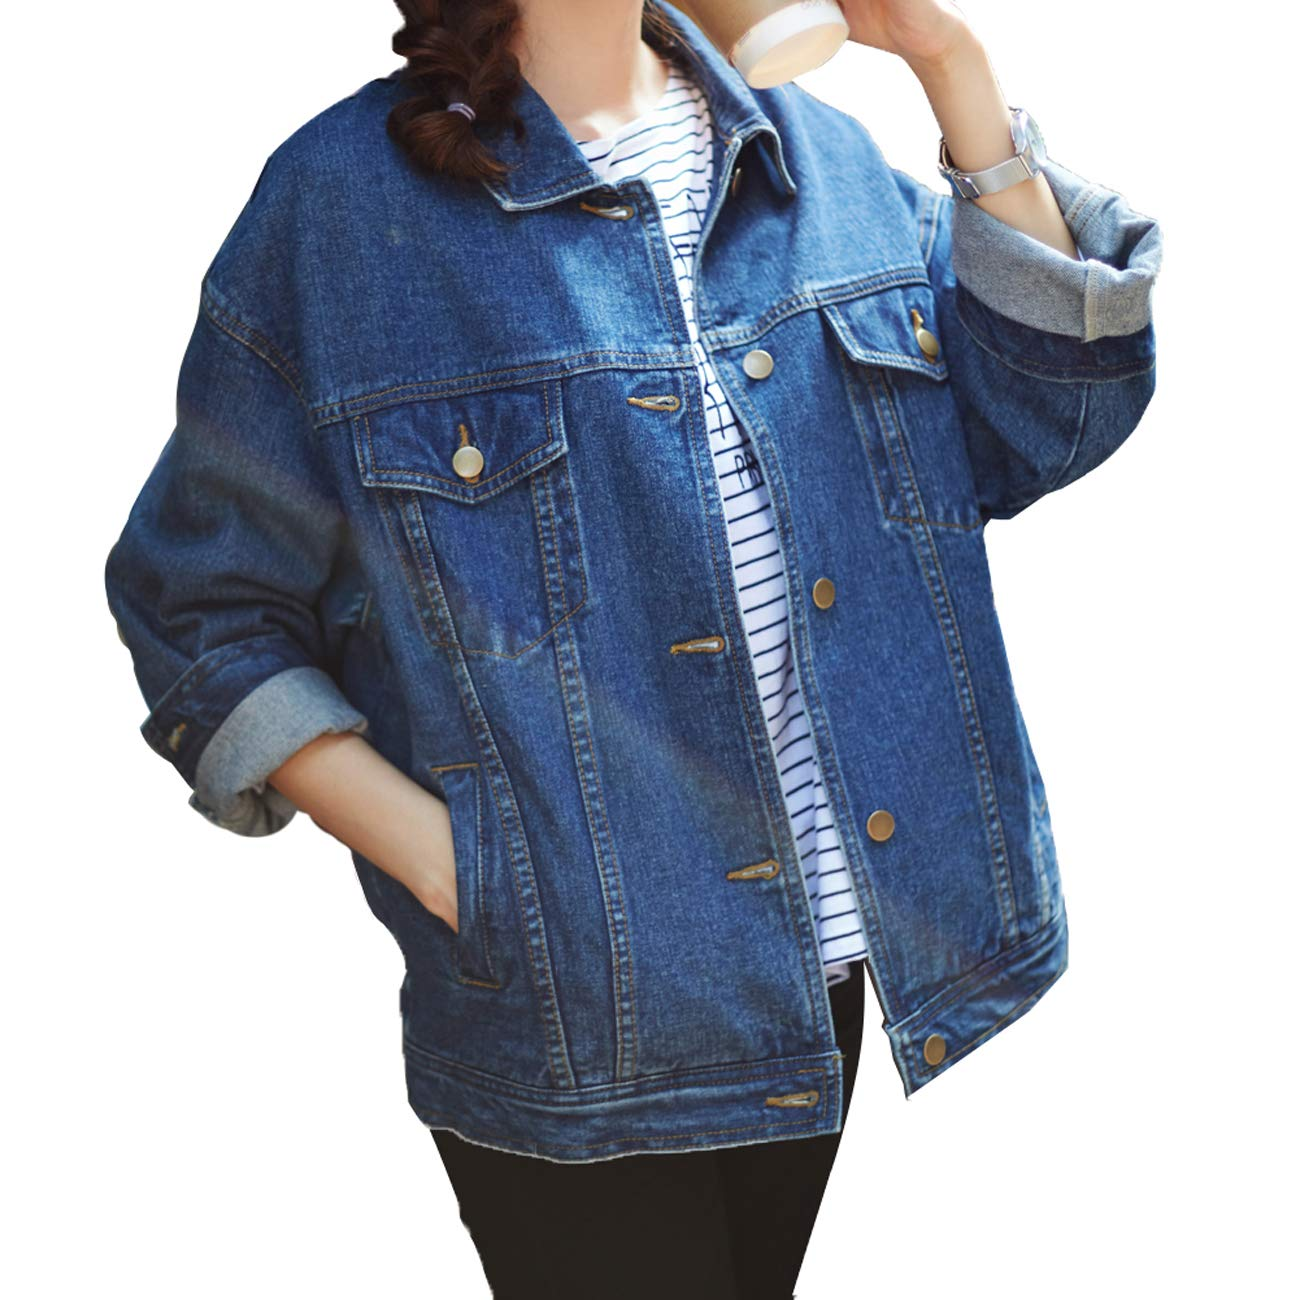 Loose Blue Denim Jackets for Women,Navy Blue Jean Jacket Women,Long Sleeve Womens Denim Jean Jacket